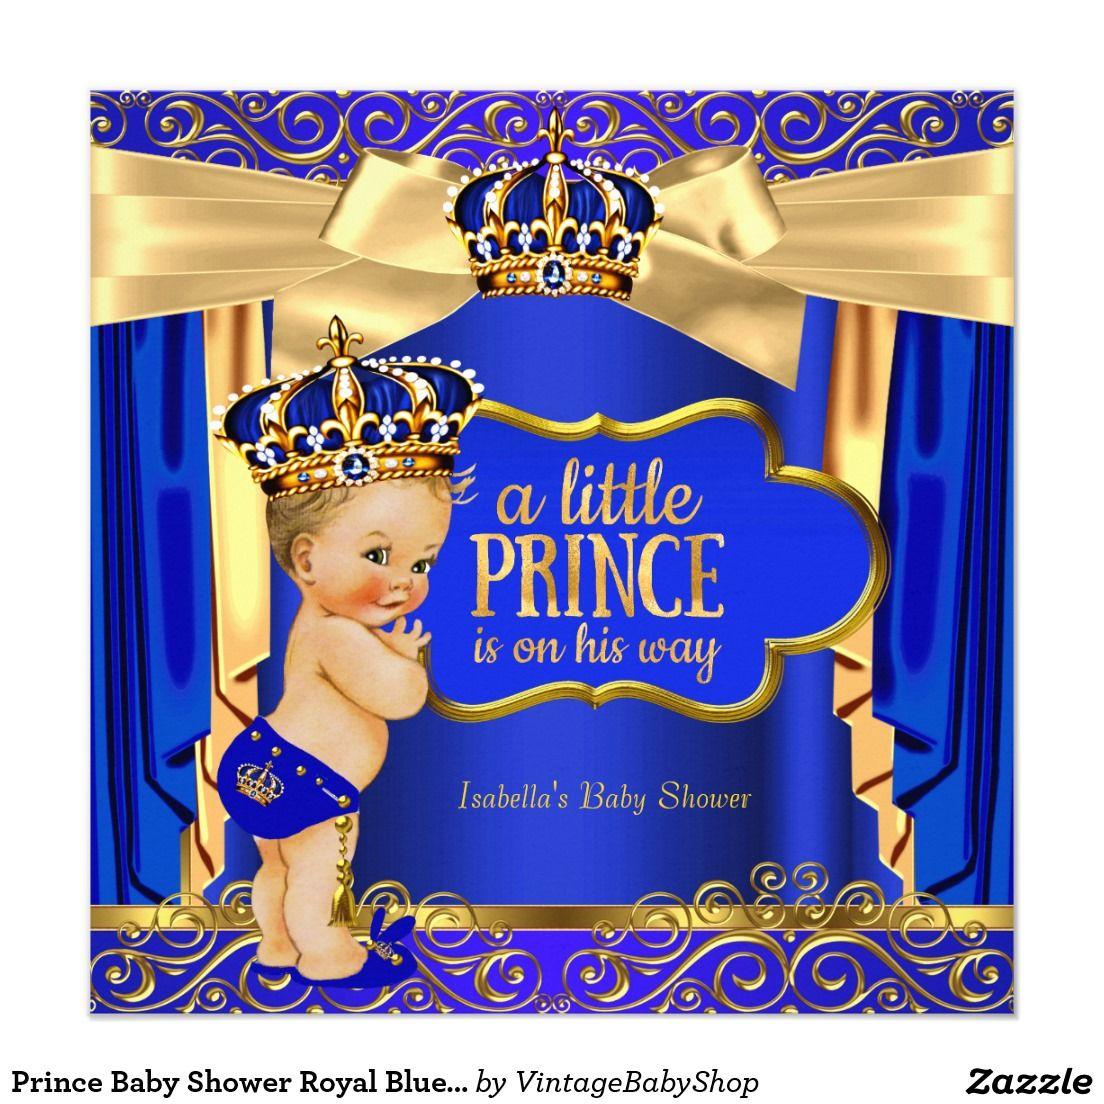 Prince Baby Shower Royal Blue Gold Drapes Blonde Invitation | Dzieci ...